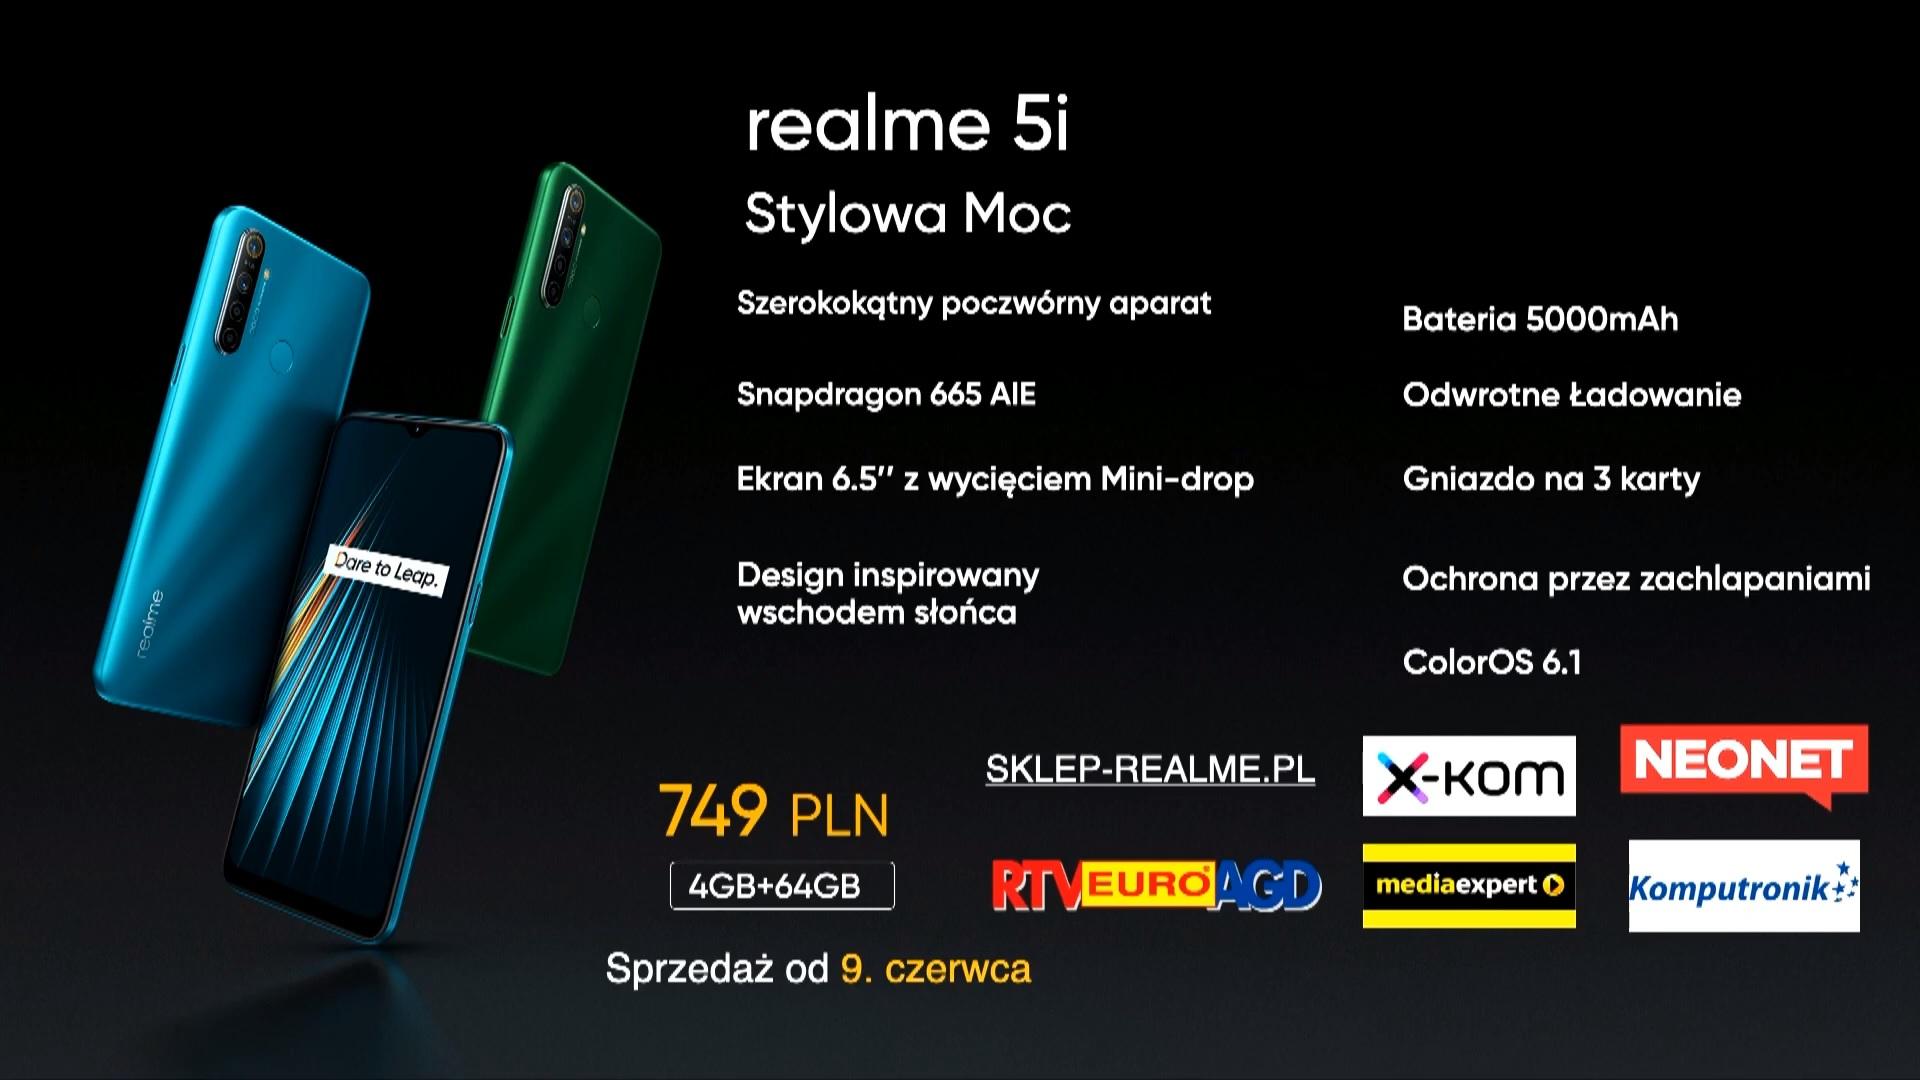 realme 5i price Poland